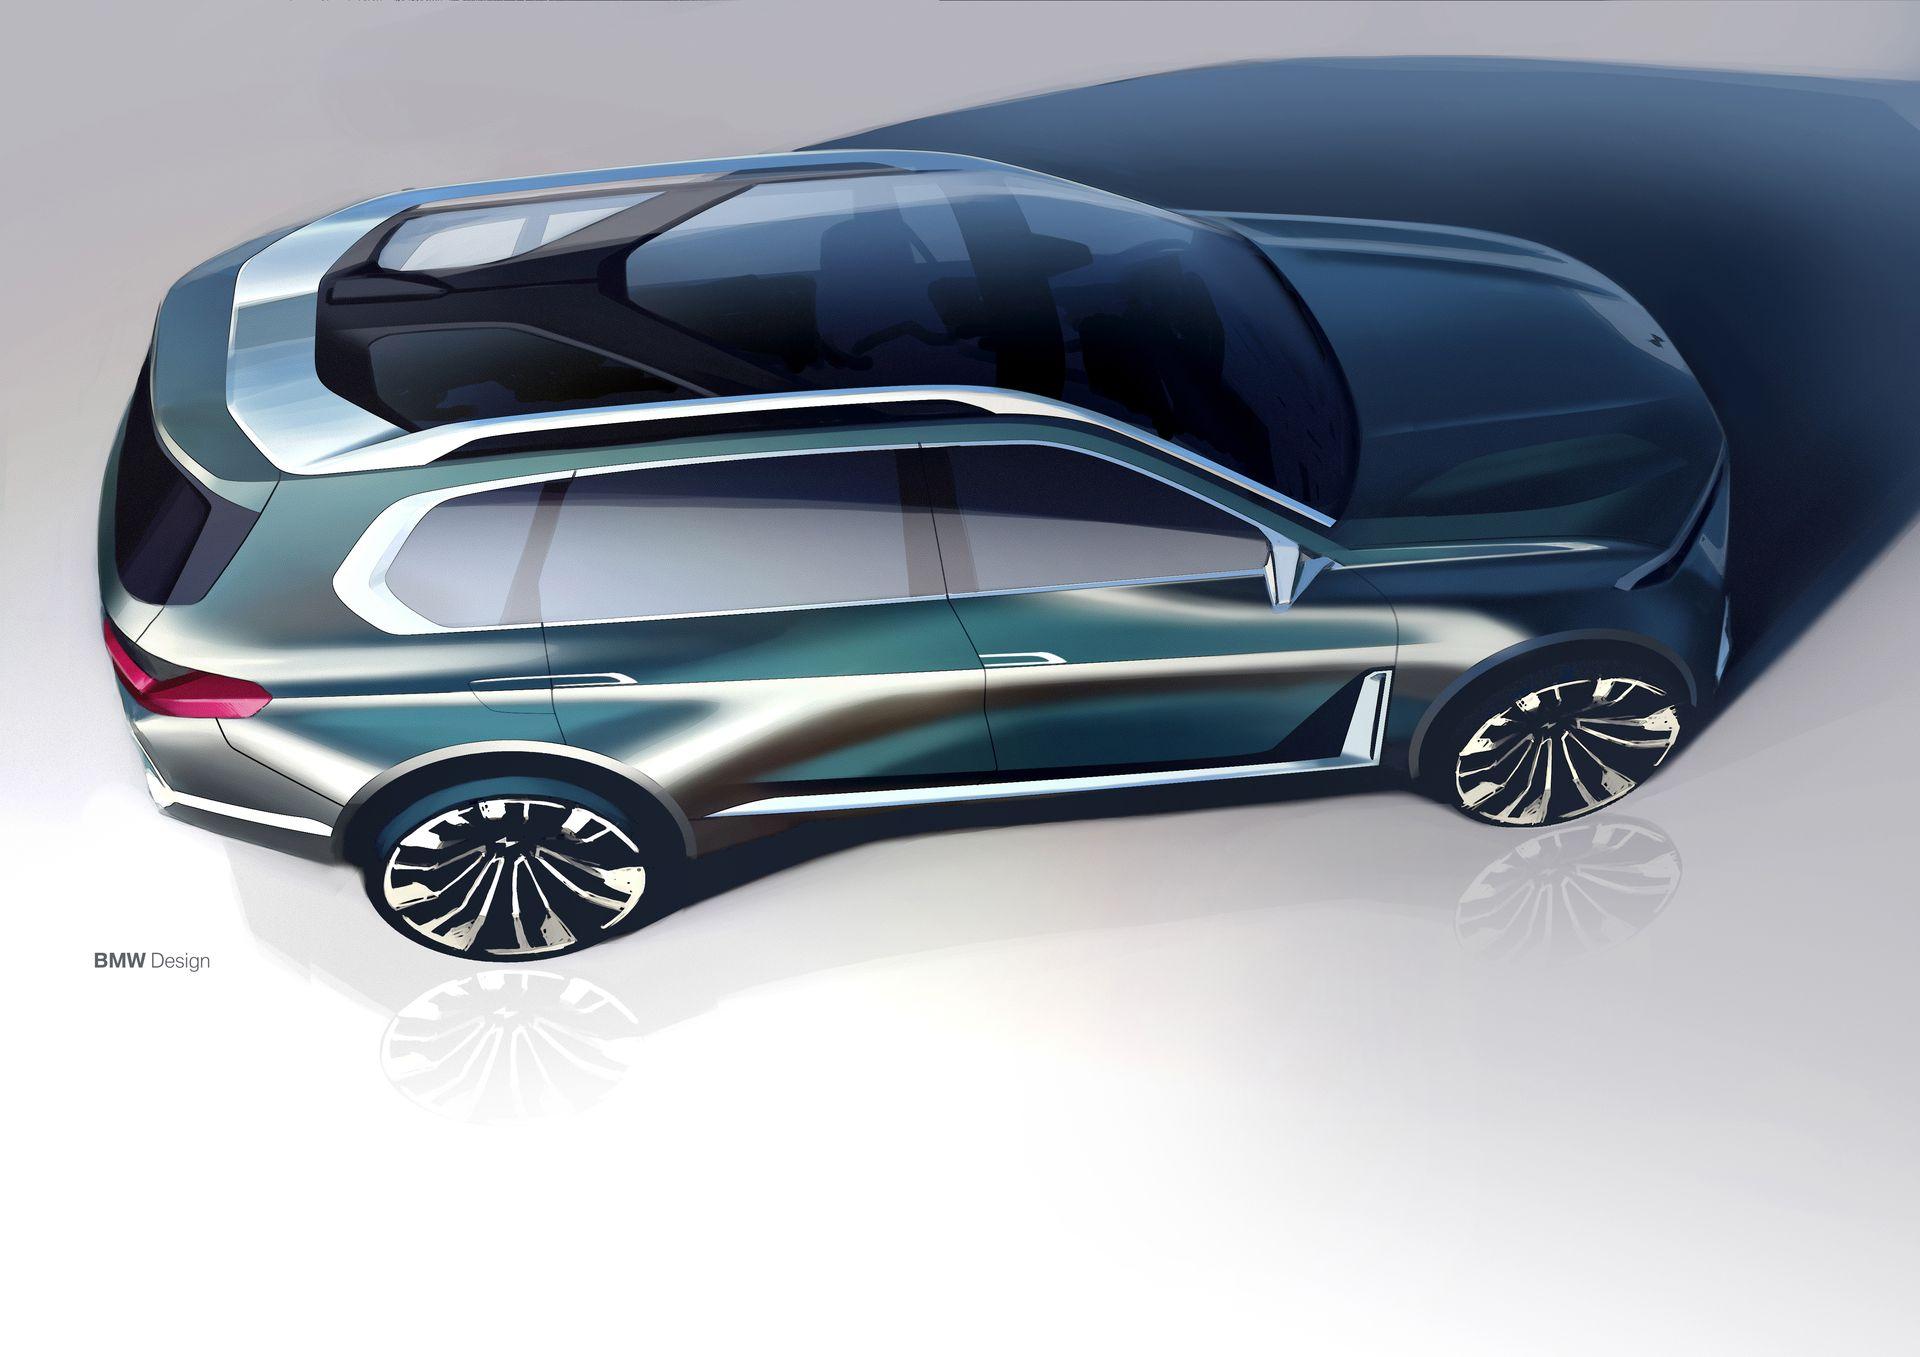 BMW X7 iPerformance design